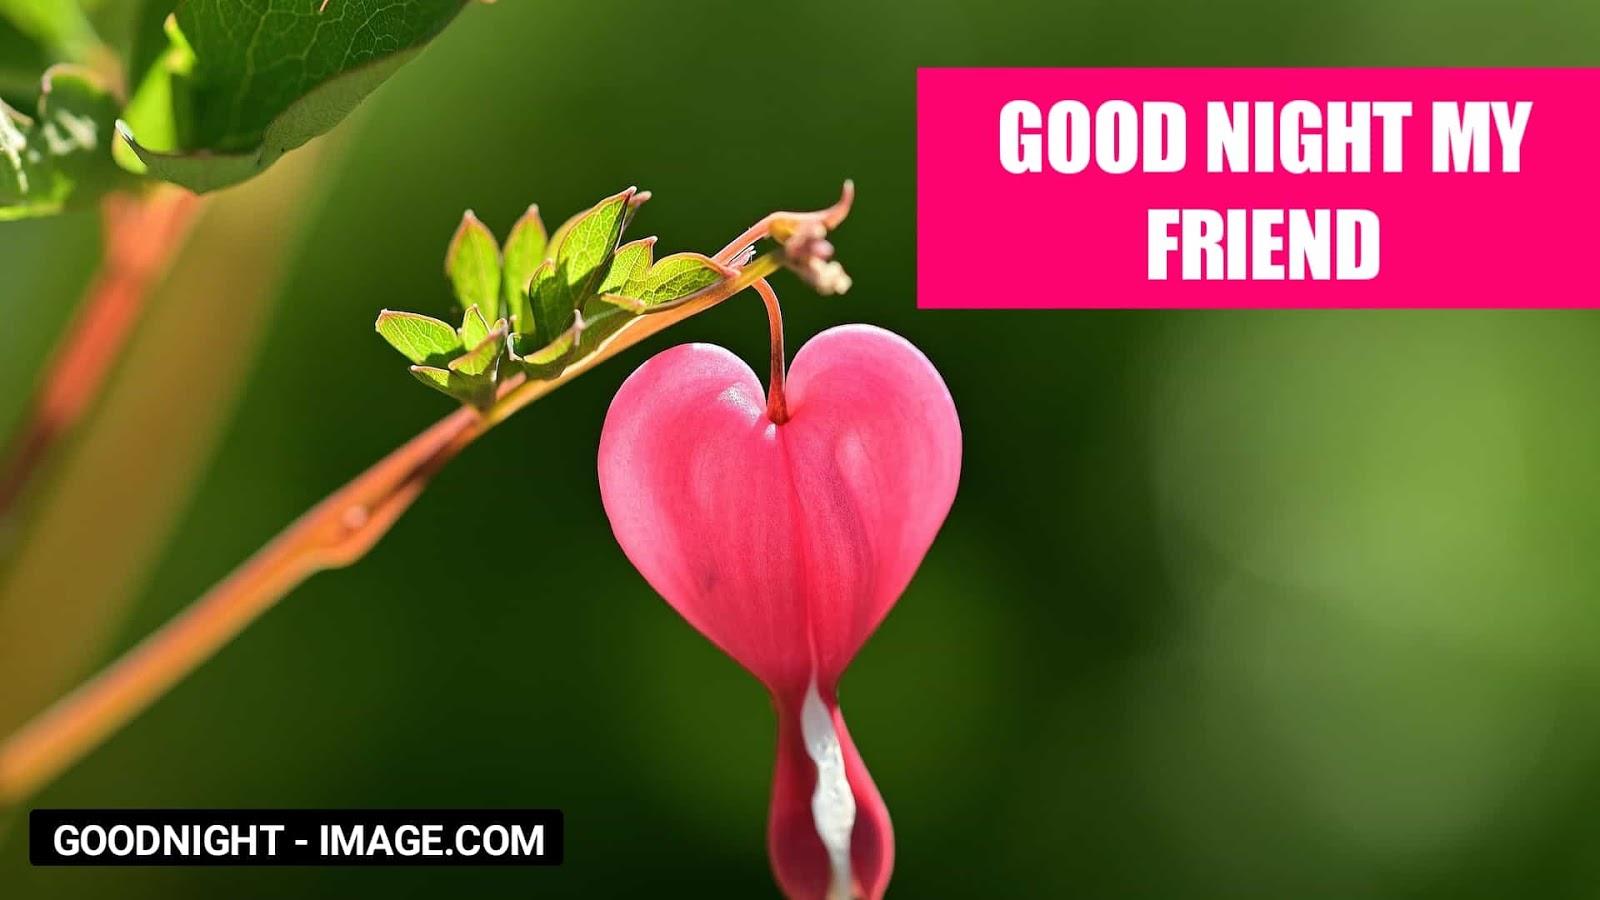 Beautiful Image For Dp - Love Friend Beautiful Good Night - HD Wallpaper